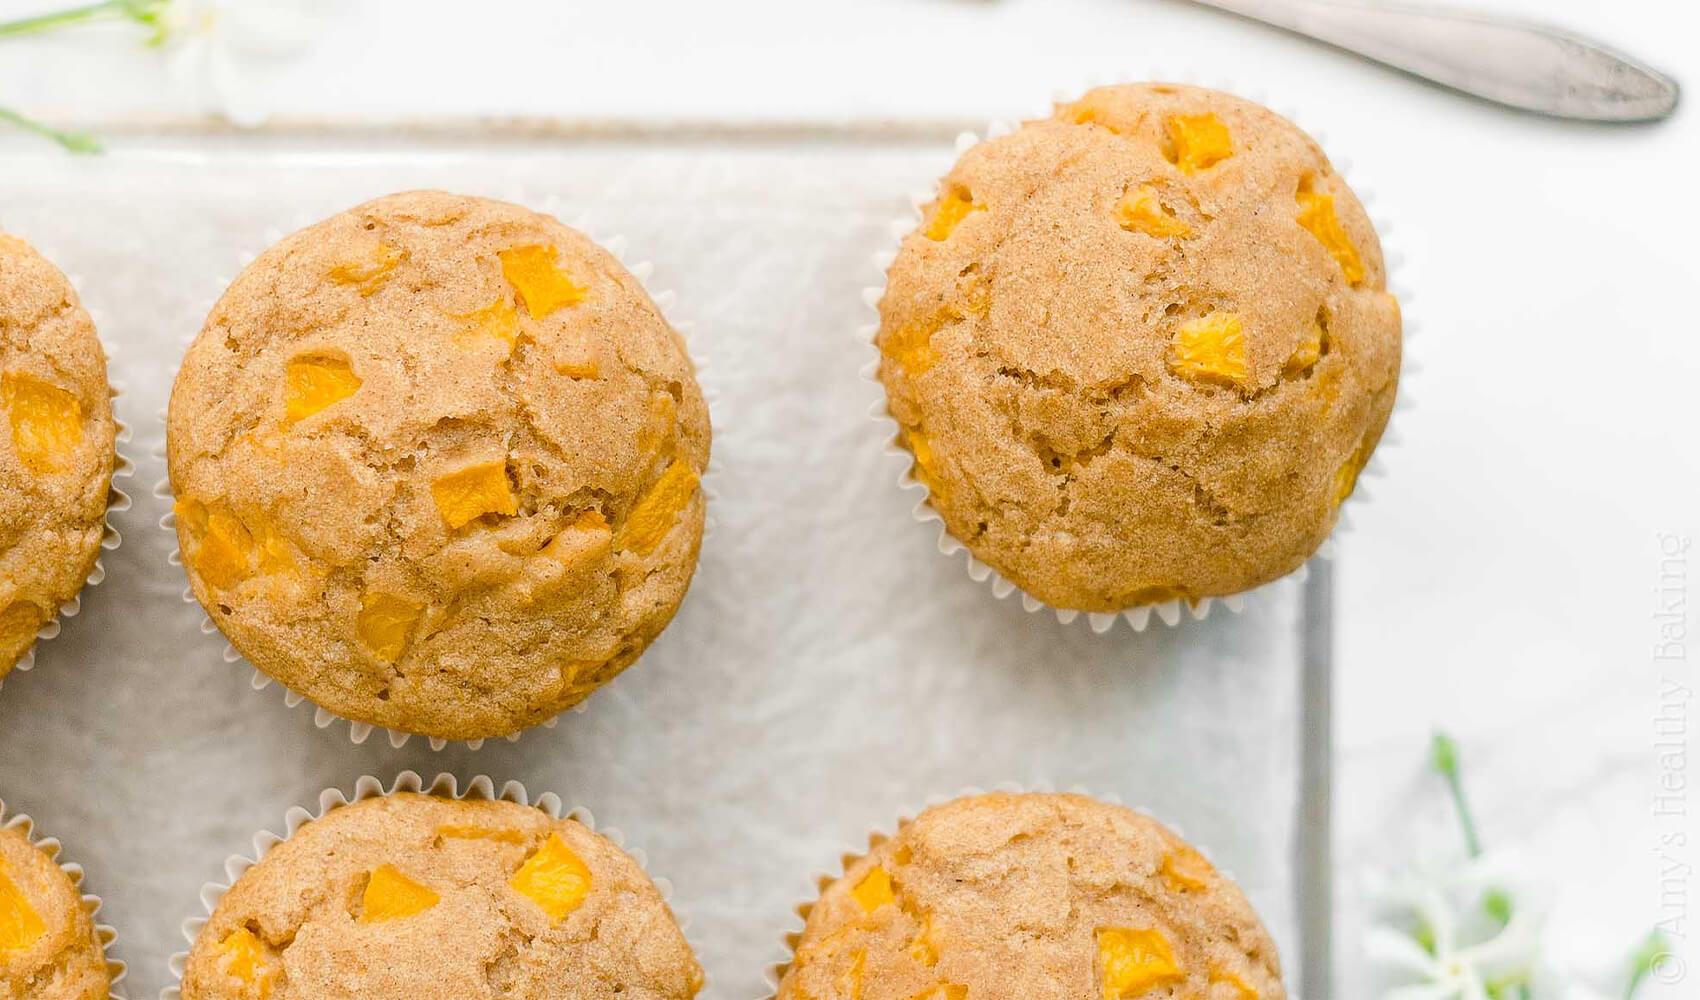 Healthy One-Bowl Peach Muffins